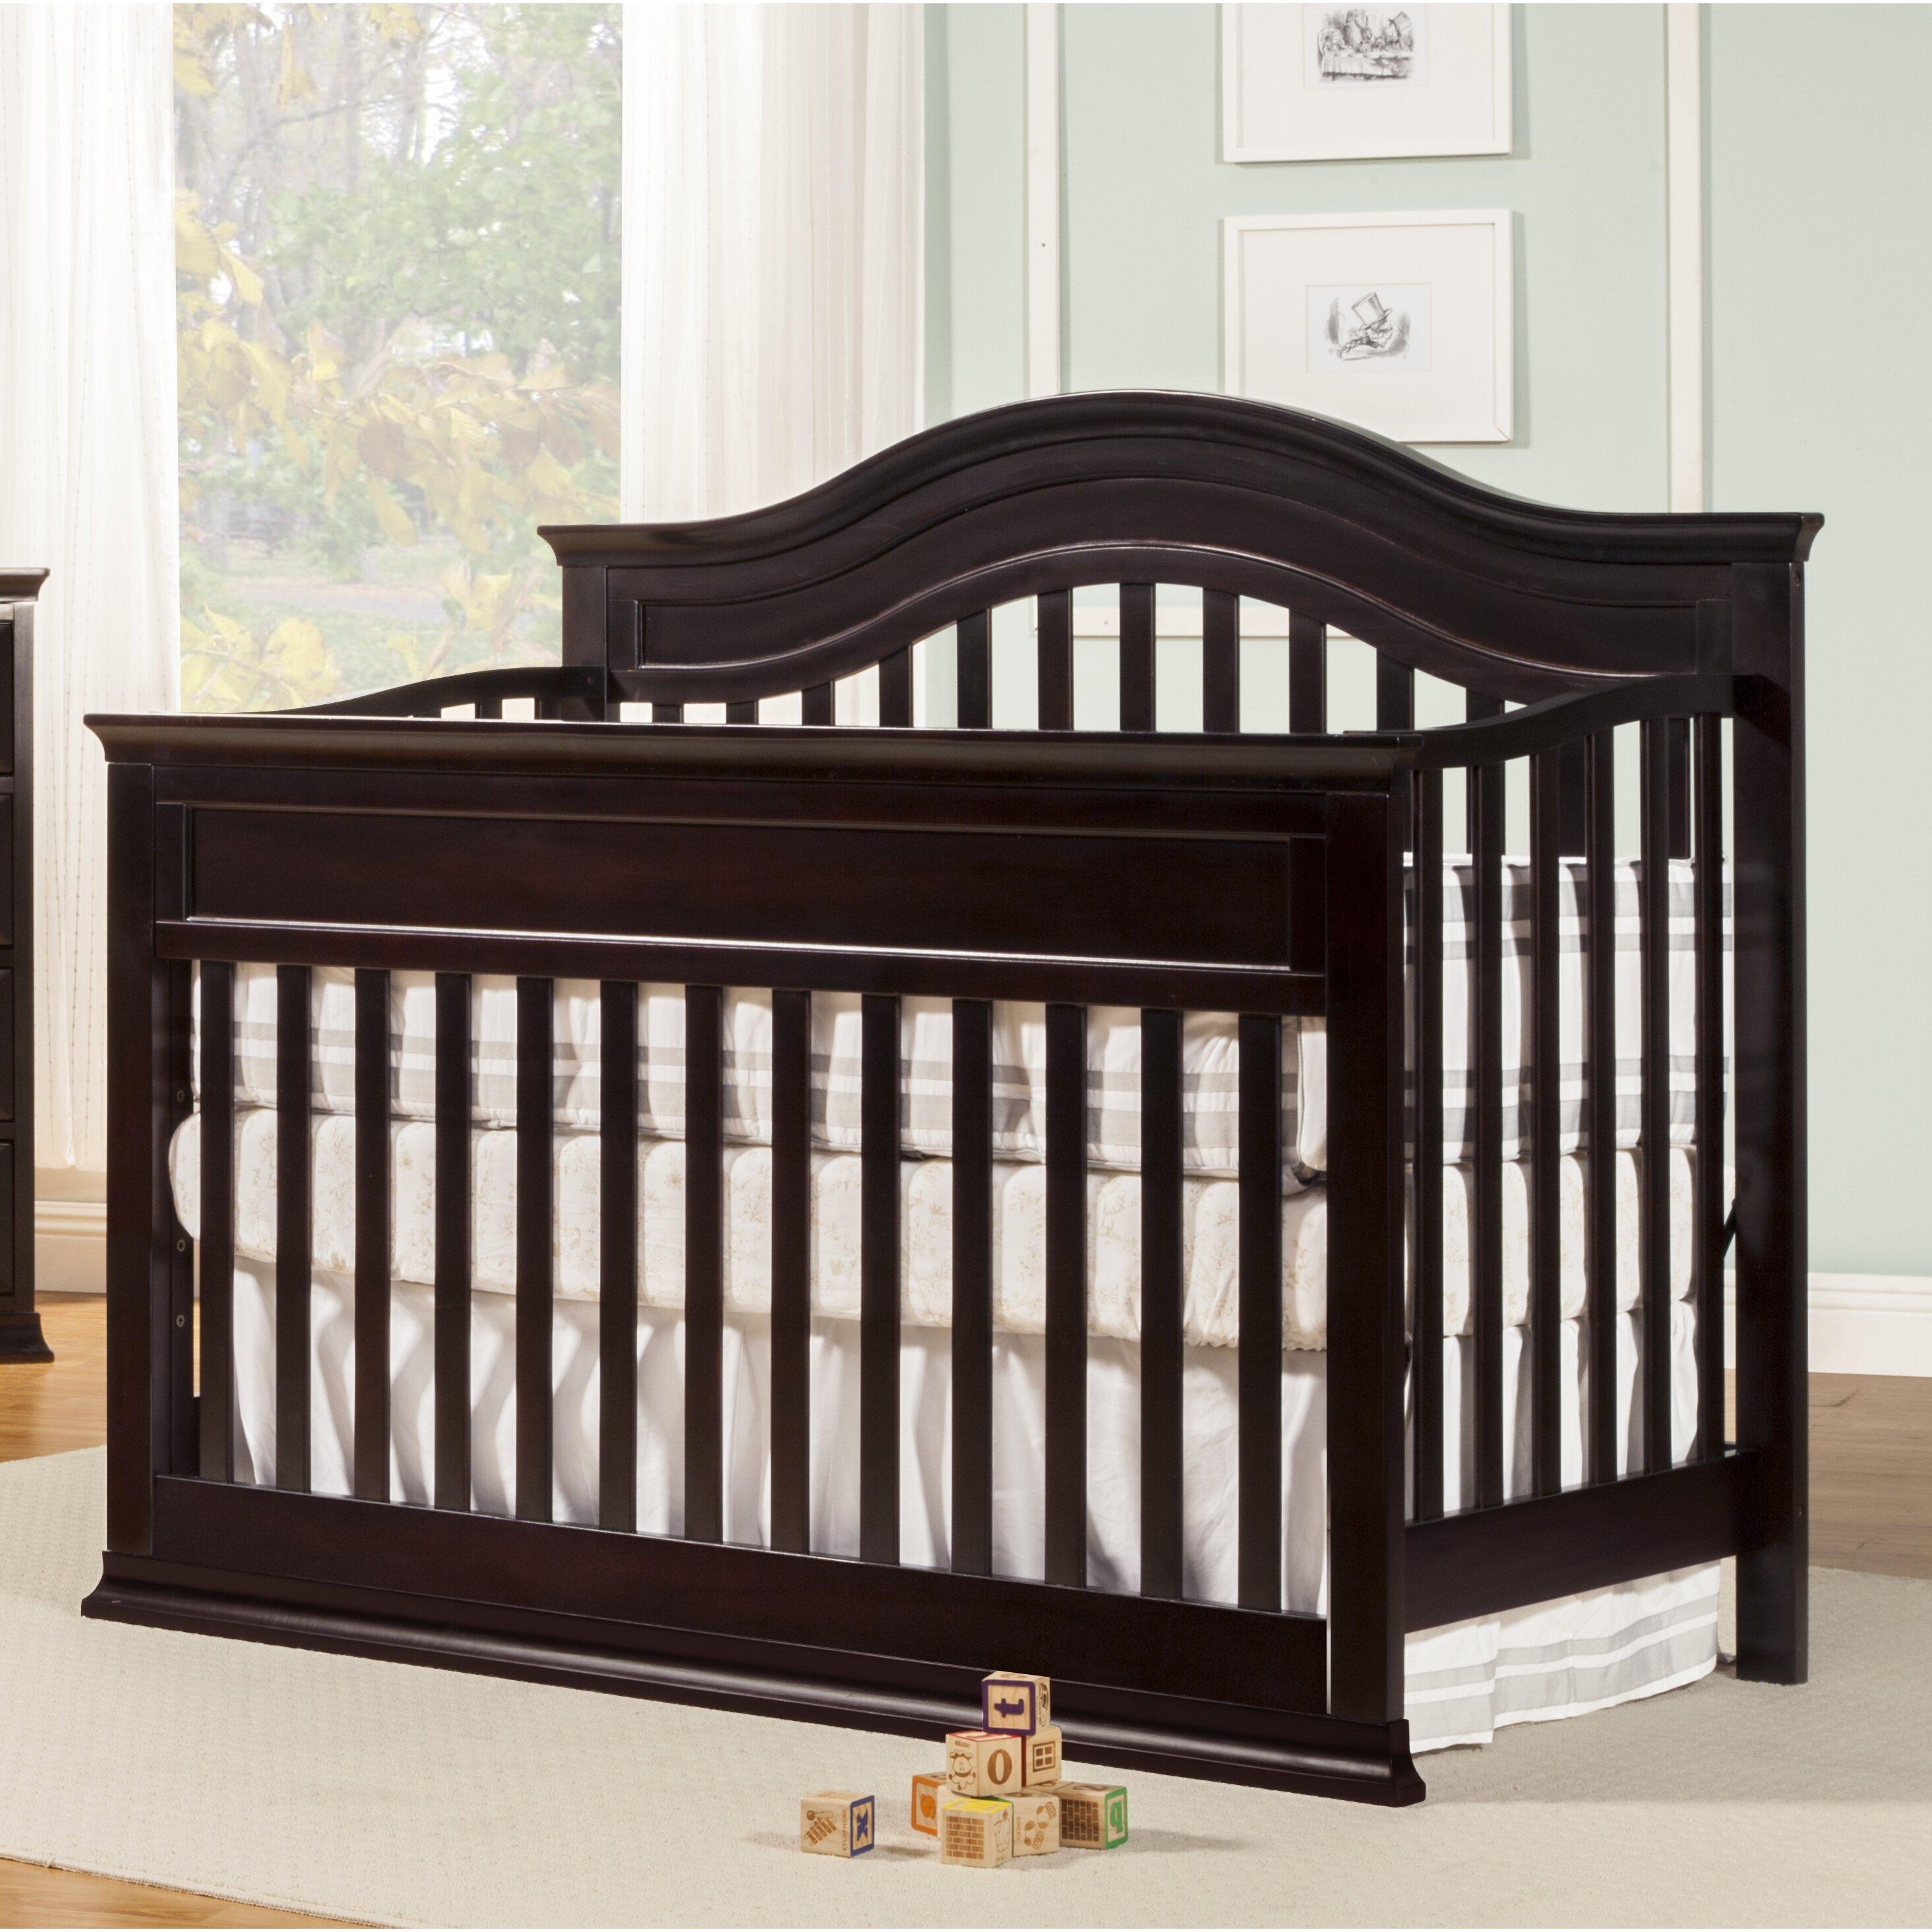 Wayfair Com Baby Furniture